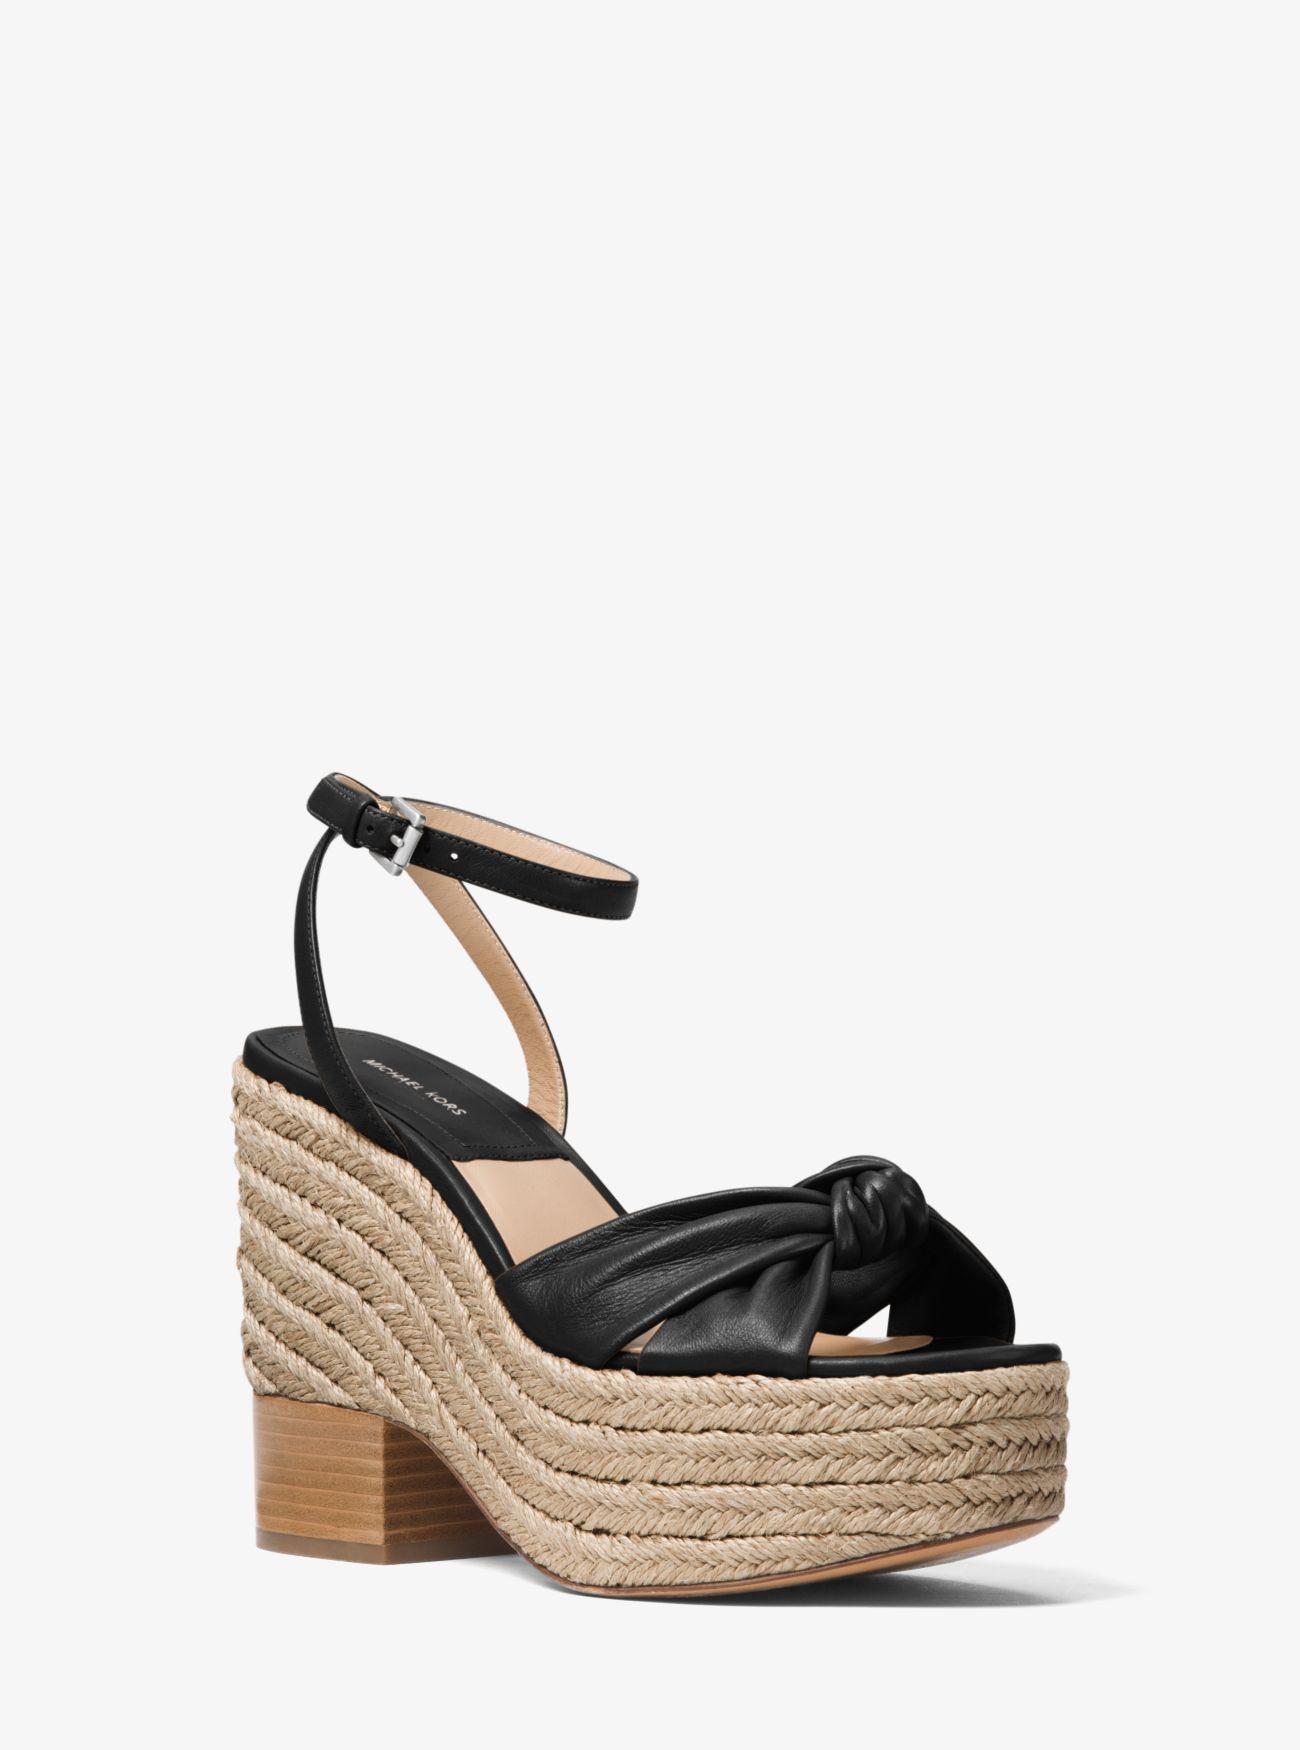 4c9b29a434f3 Lyst - Michael Kors Silvana Leather Platform Sandal in Black